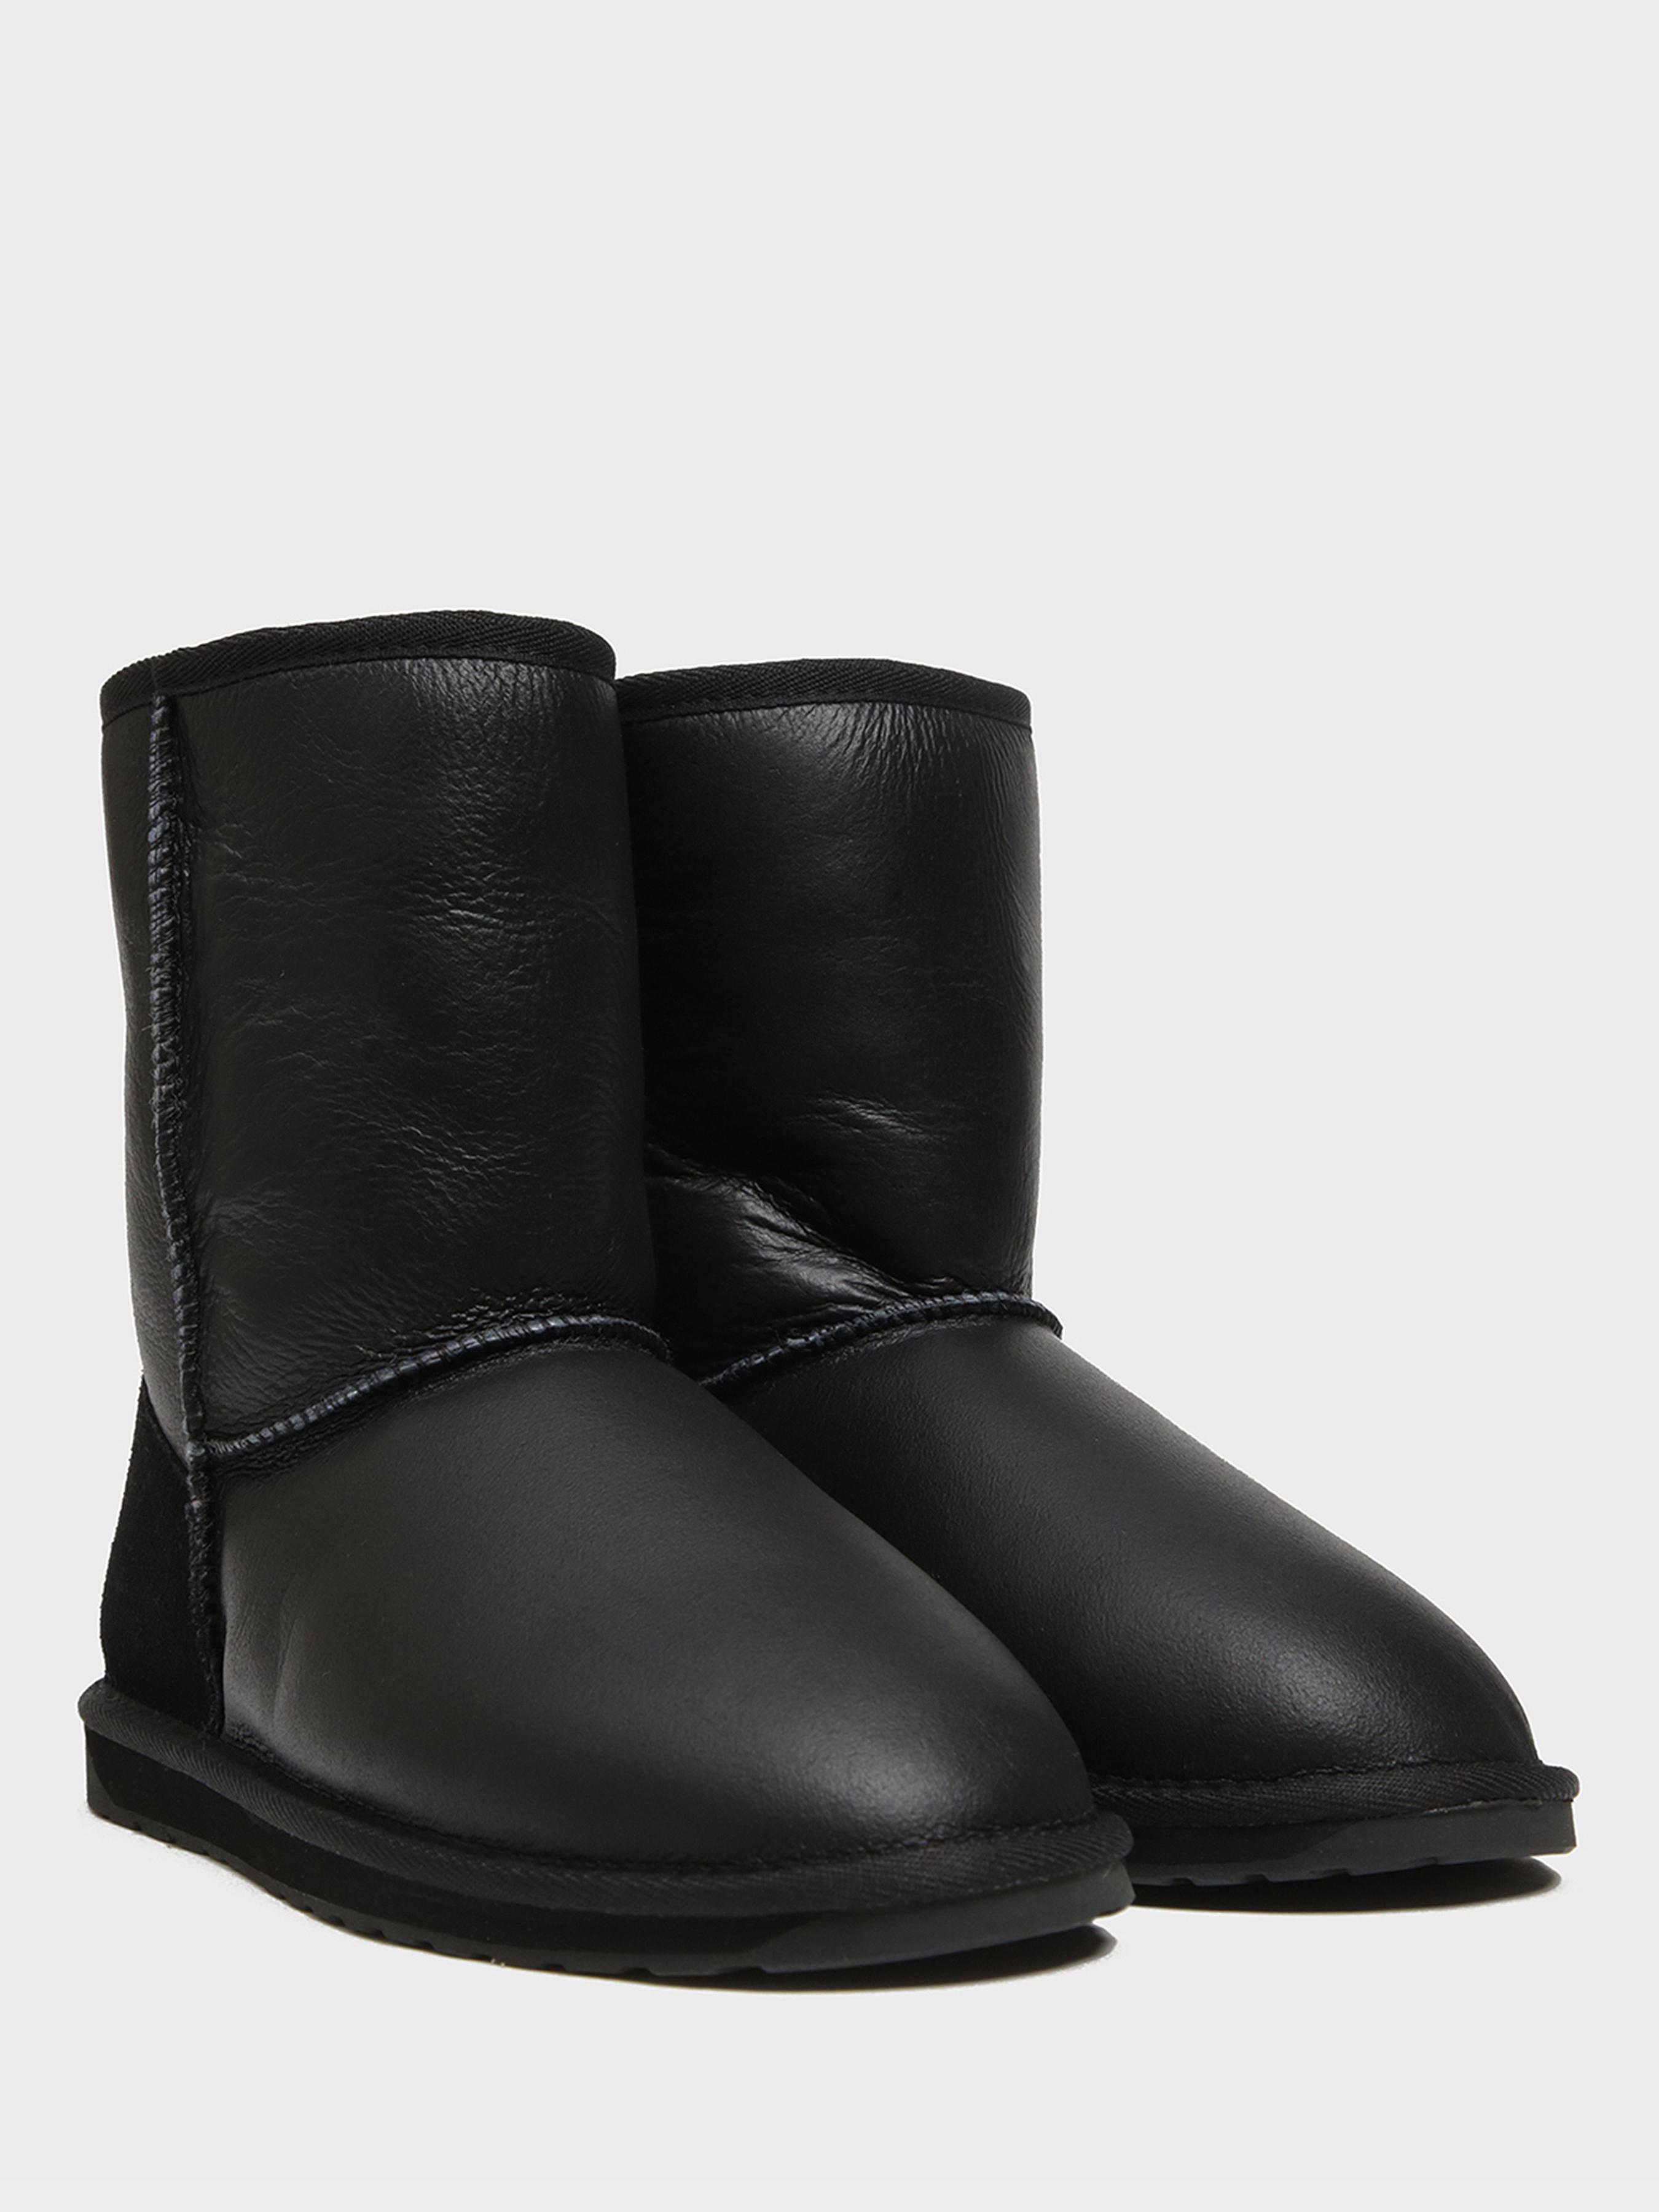 Ботинки женские EMU YK63 купить онлайн, 2017